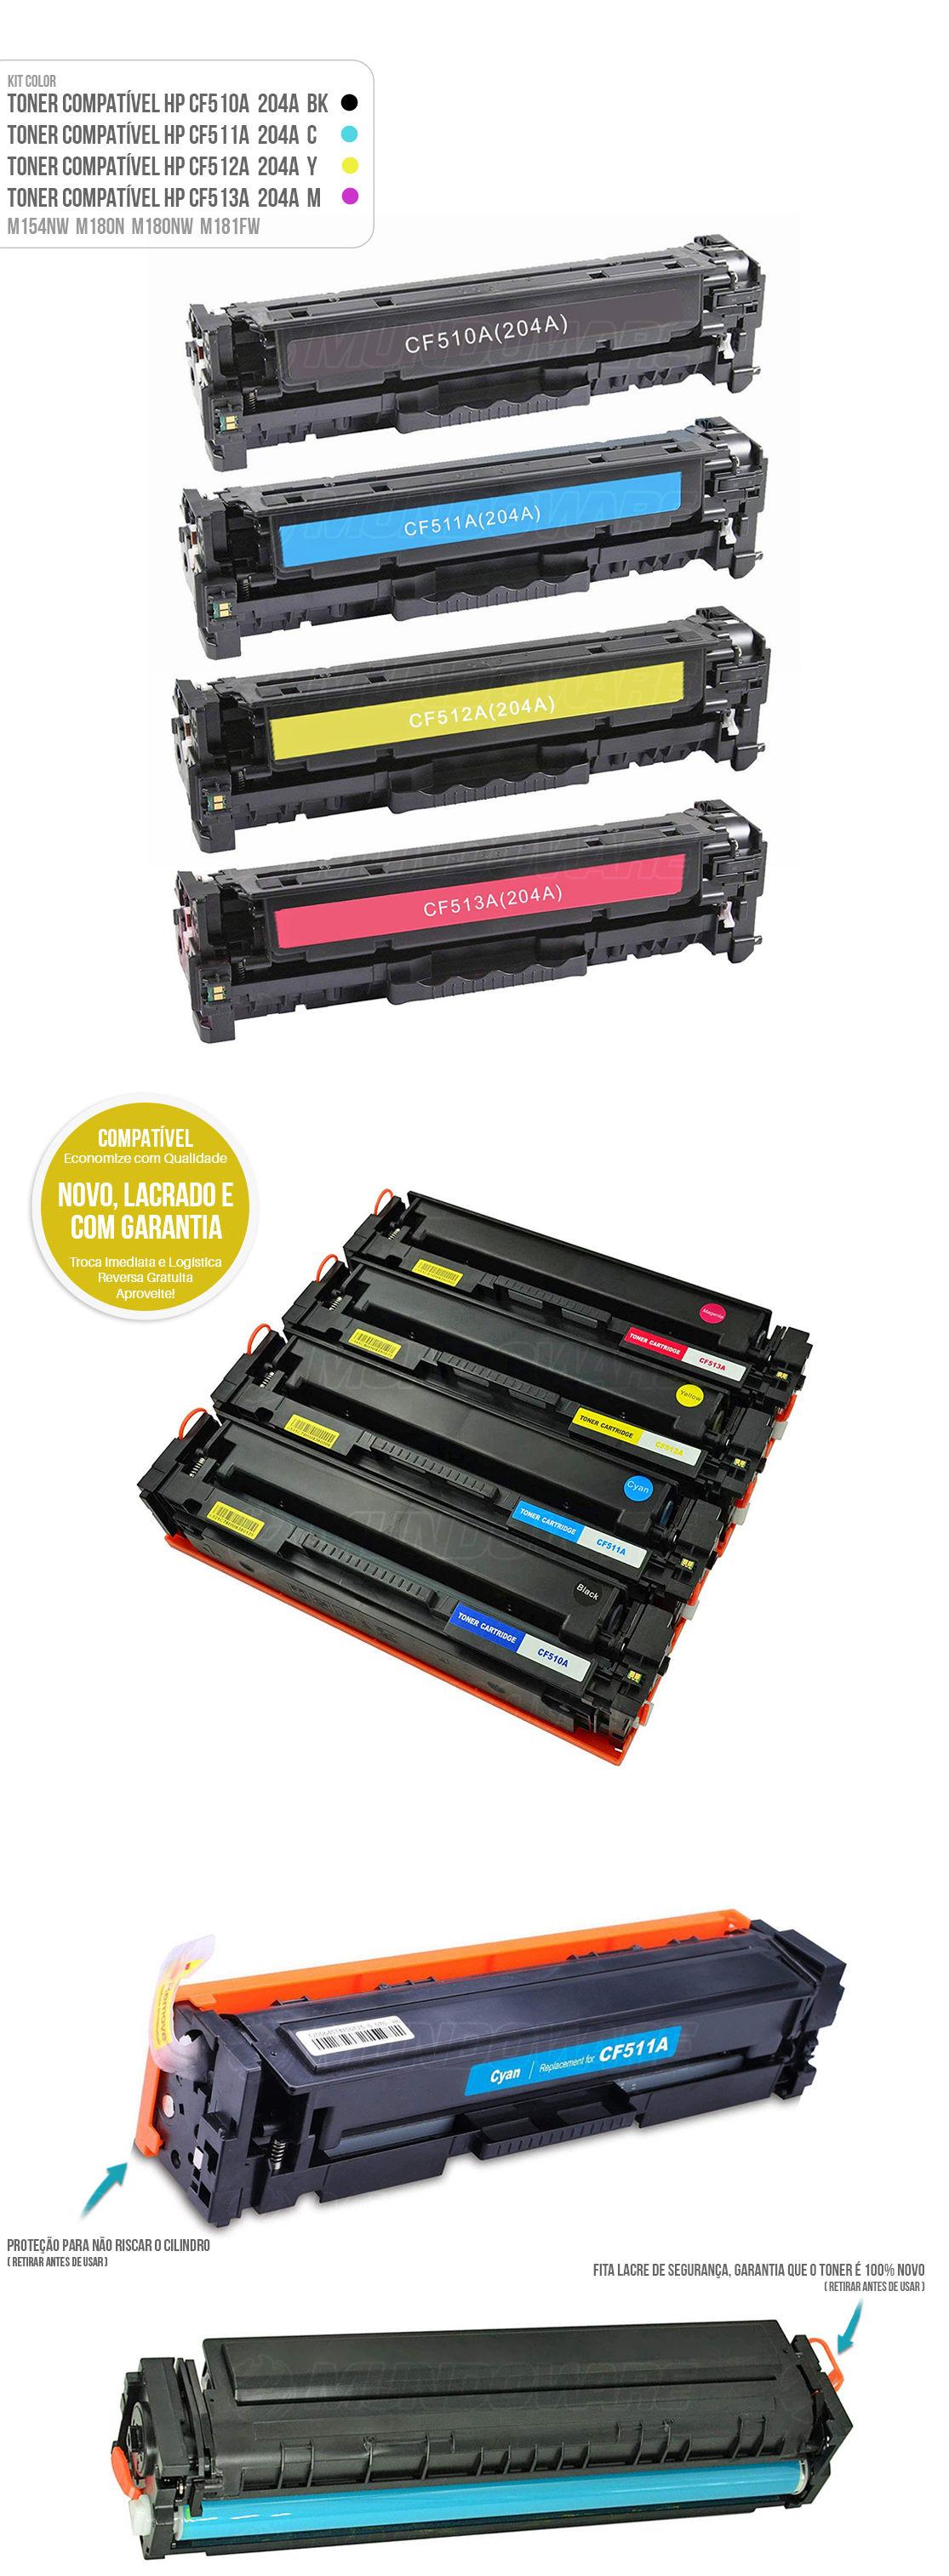 Kit Colorido de Toner para impressora Laser M154 M154A M154NW M180 M180N M180NW M181 M181FW Tonner Preto Ciano Amarelo Magenta 4 cores